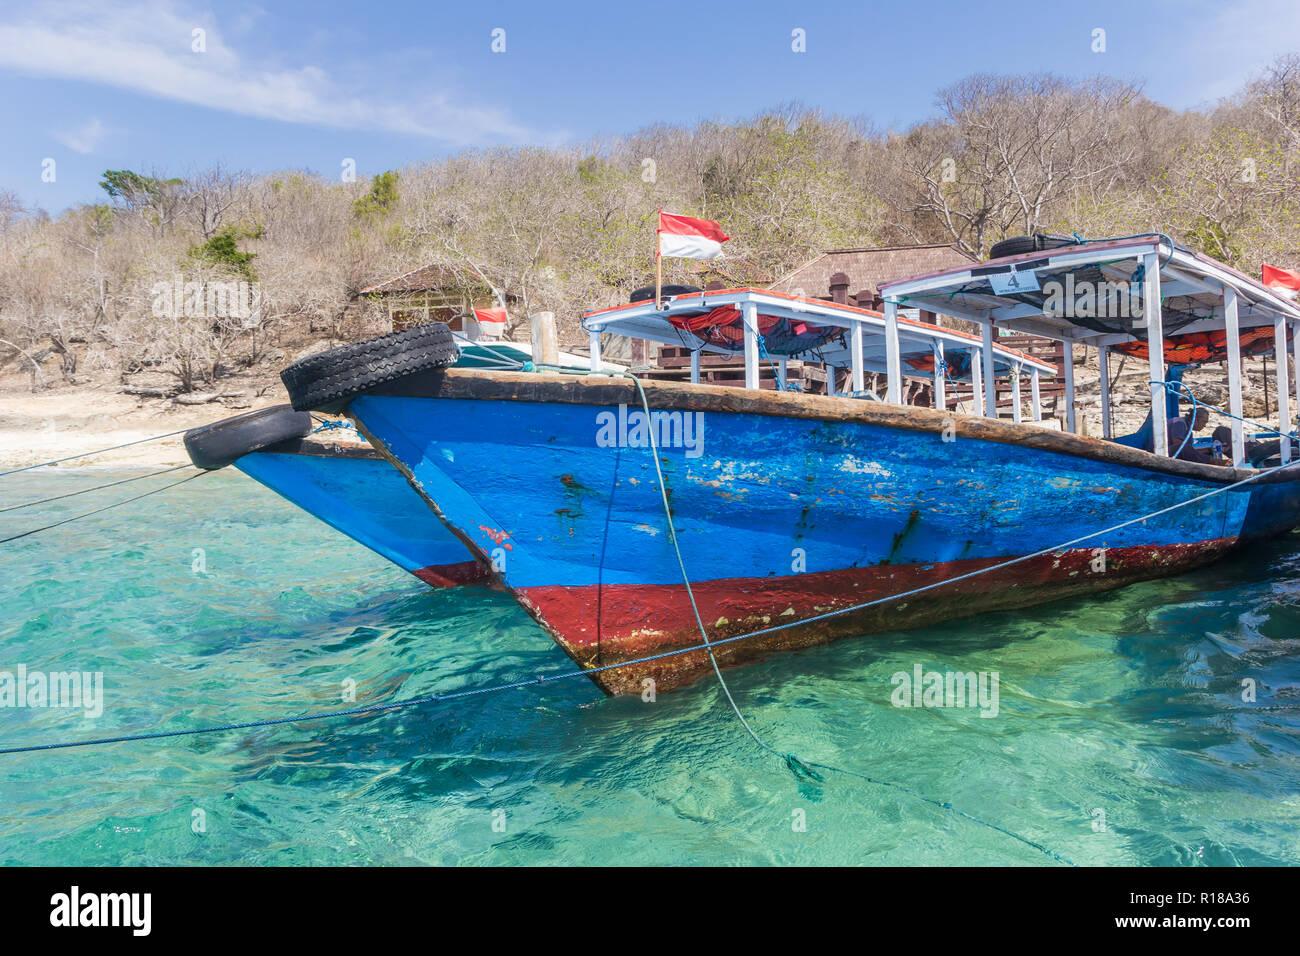 Traditional wooden boats at the beach of Menjangan Island, Indonesia - Stock Image